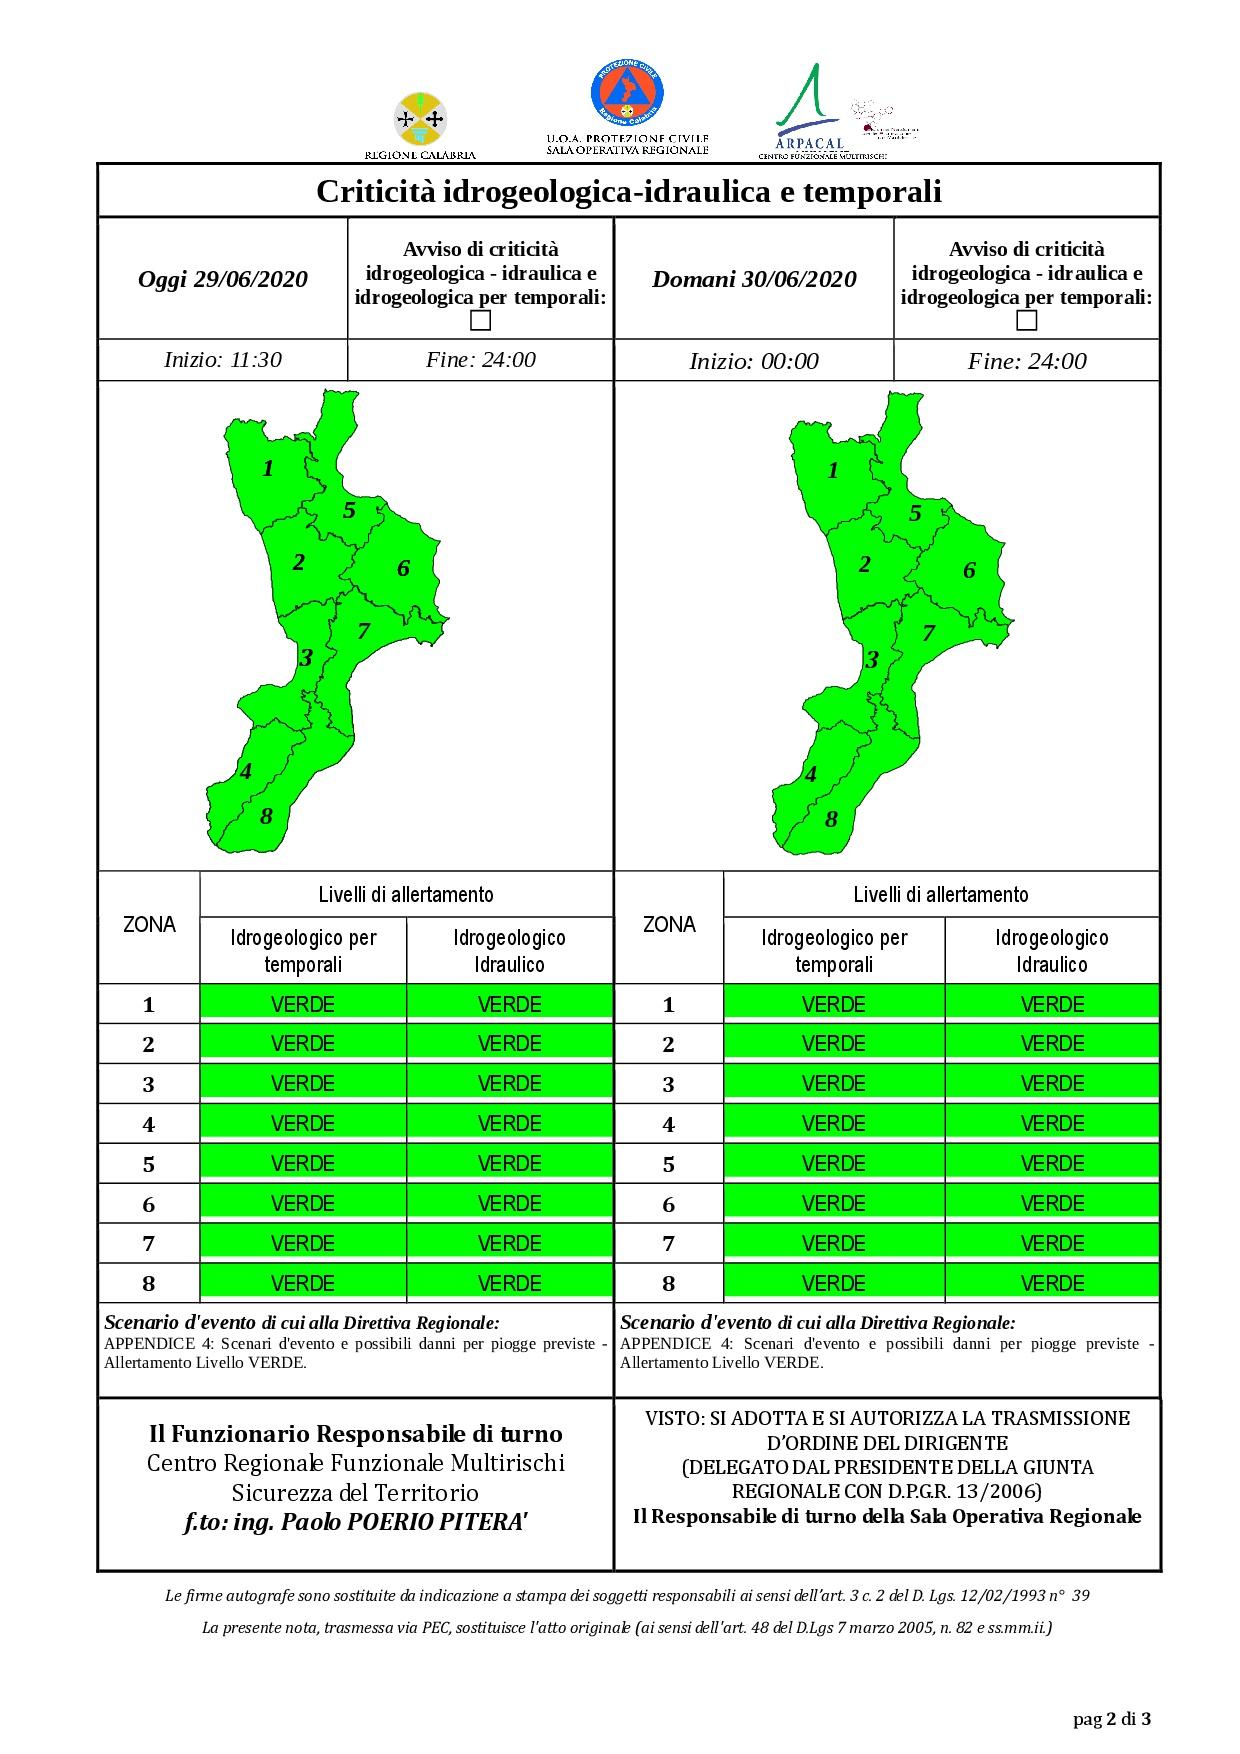 Criticità idrogeologica-idraulica e temporali in Calabria 29-06-2020